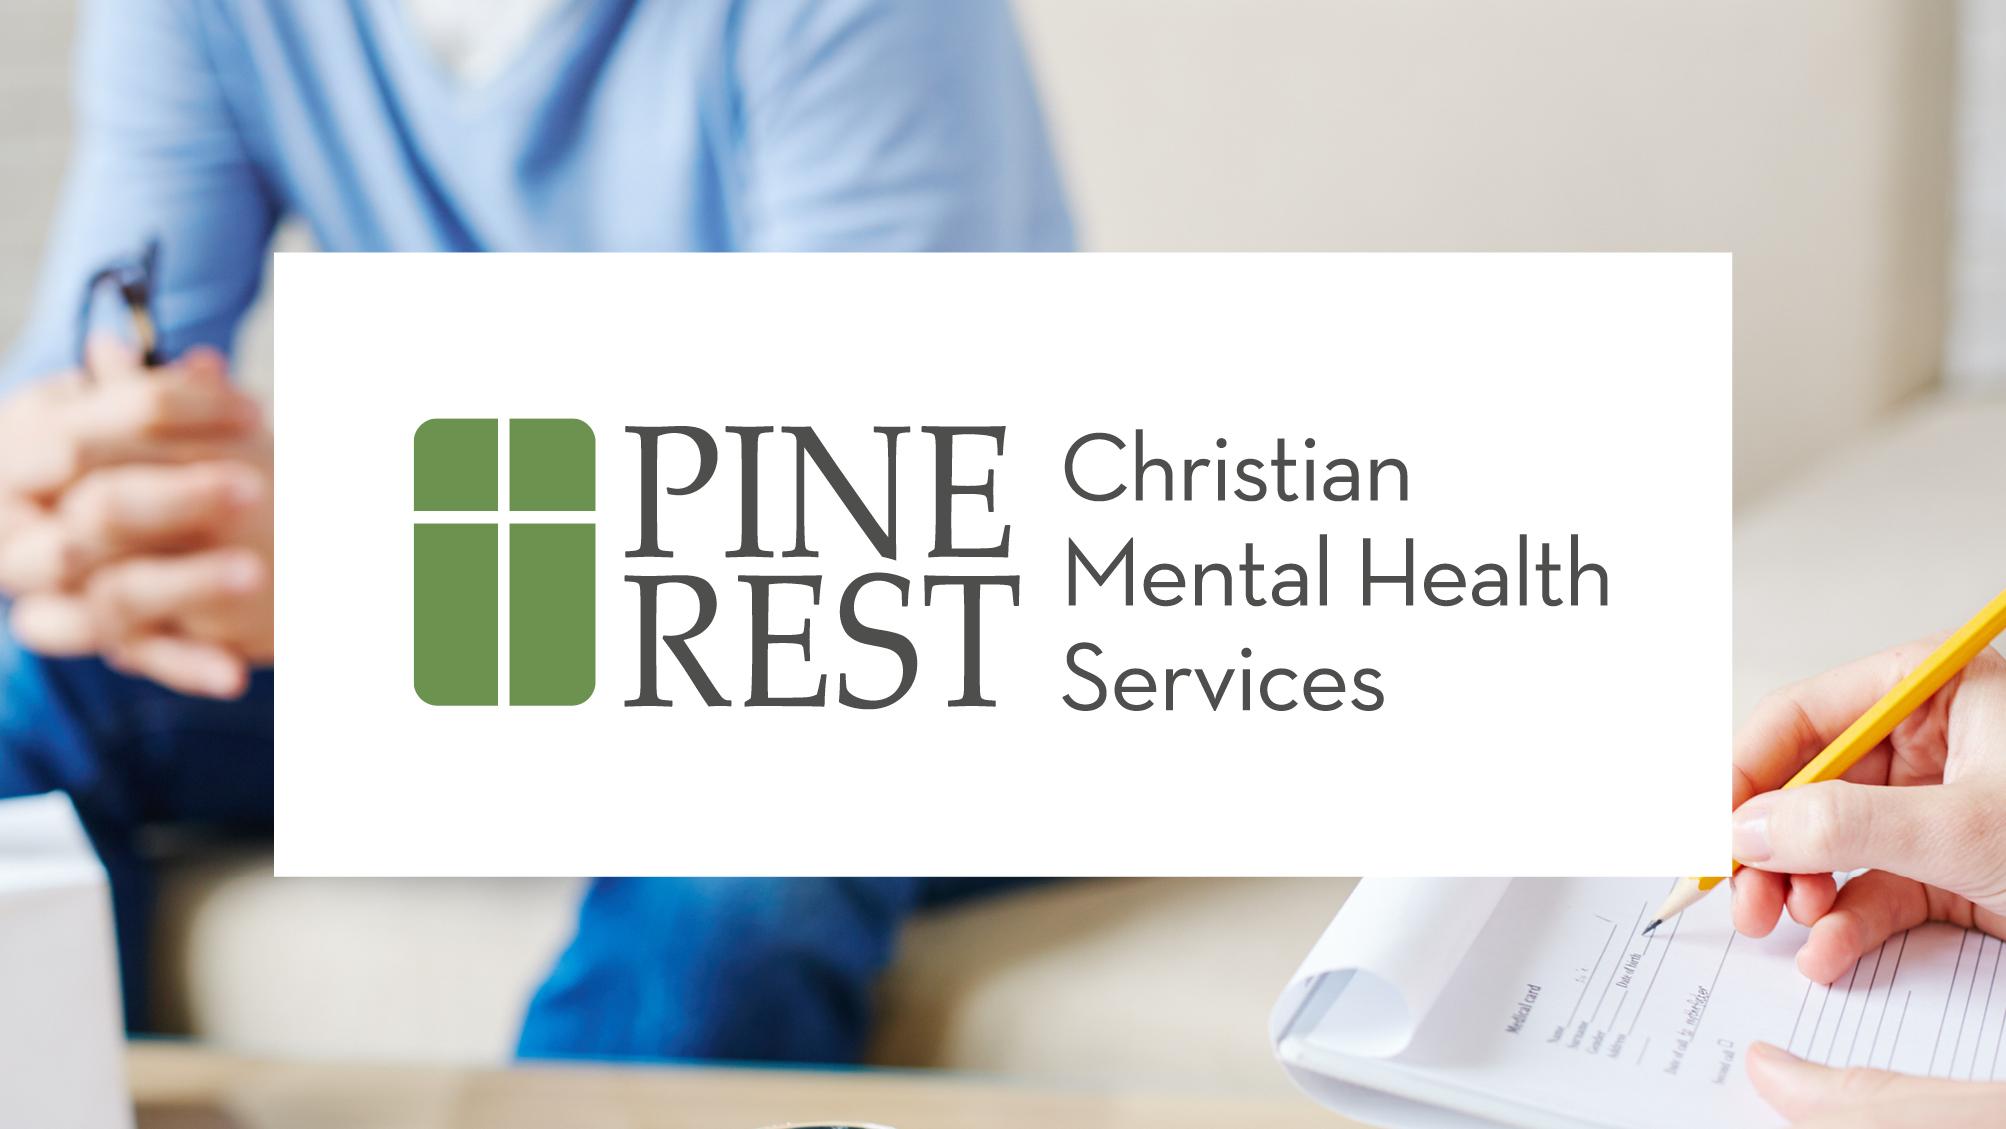 19-013 Pine Rest Case Study OG Image_963x542 at 150.jpg